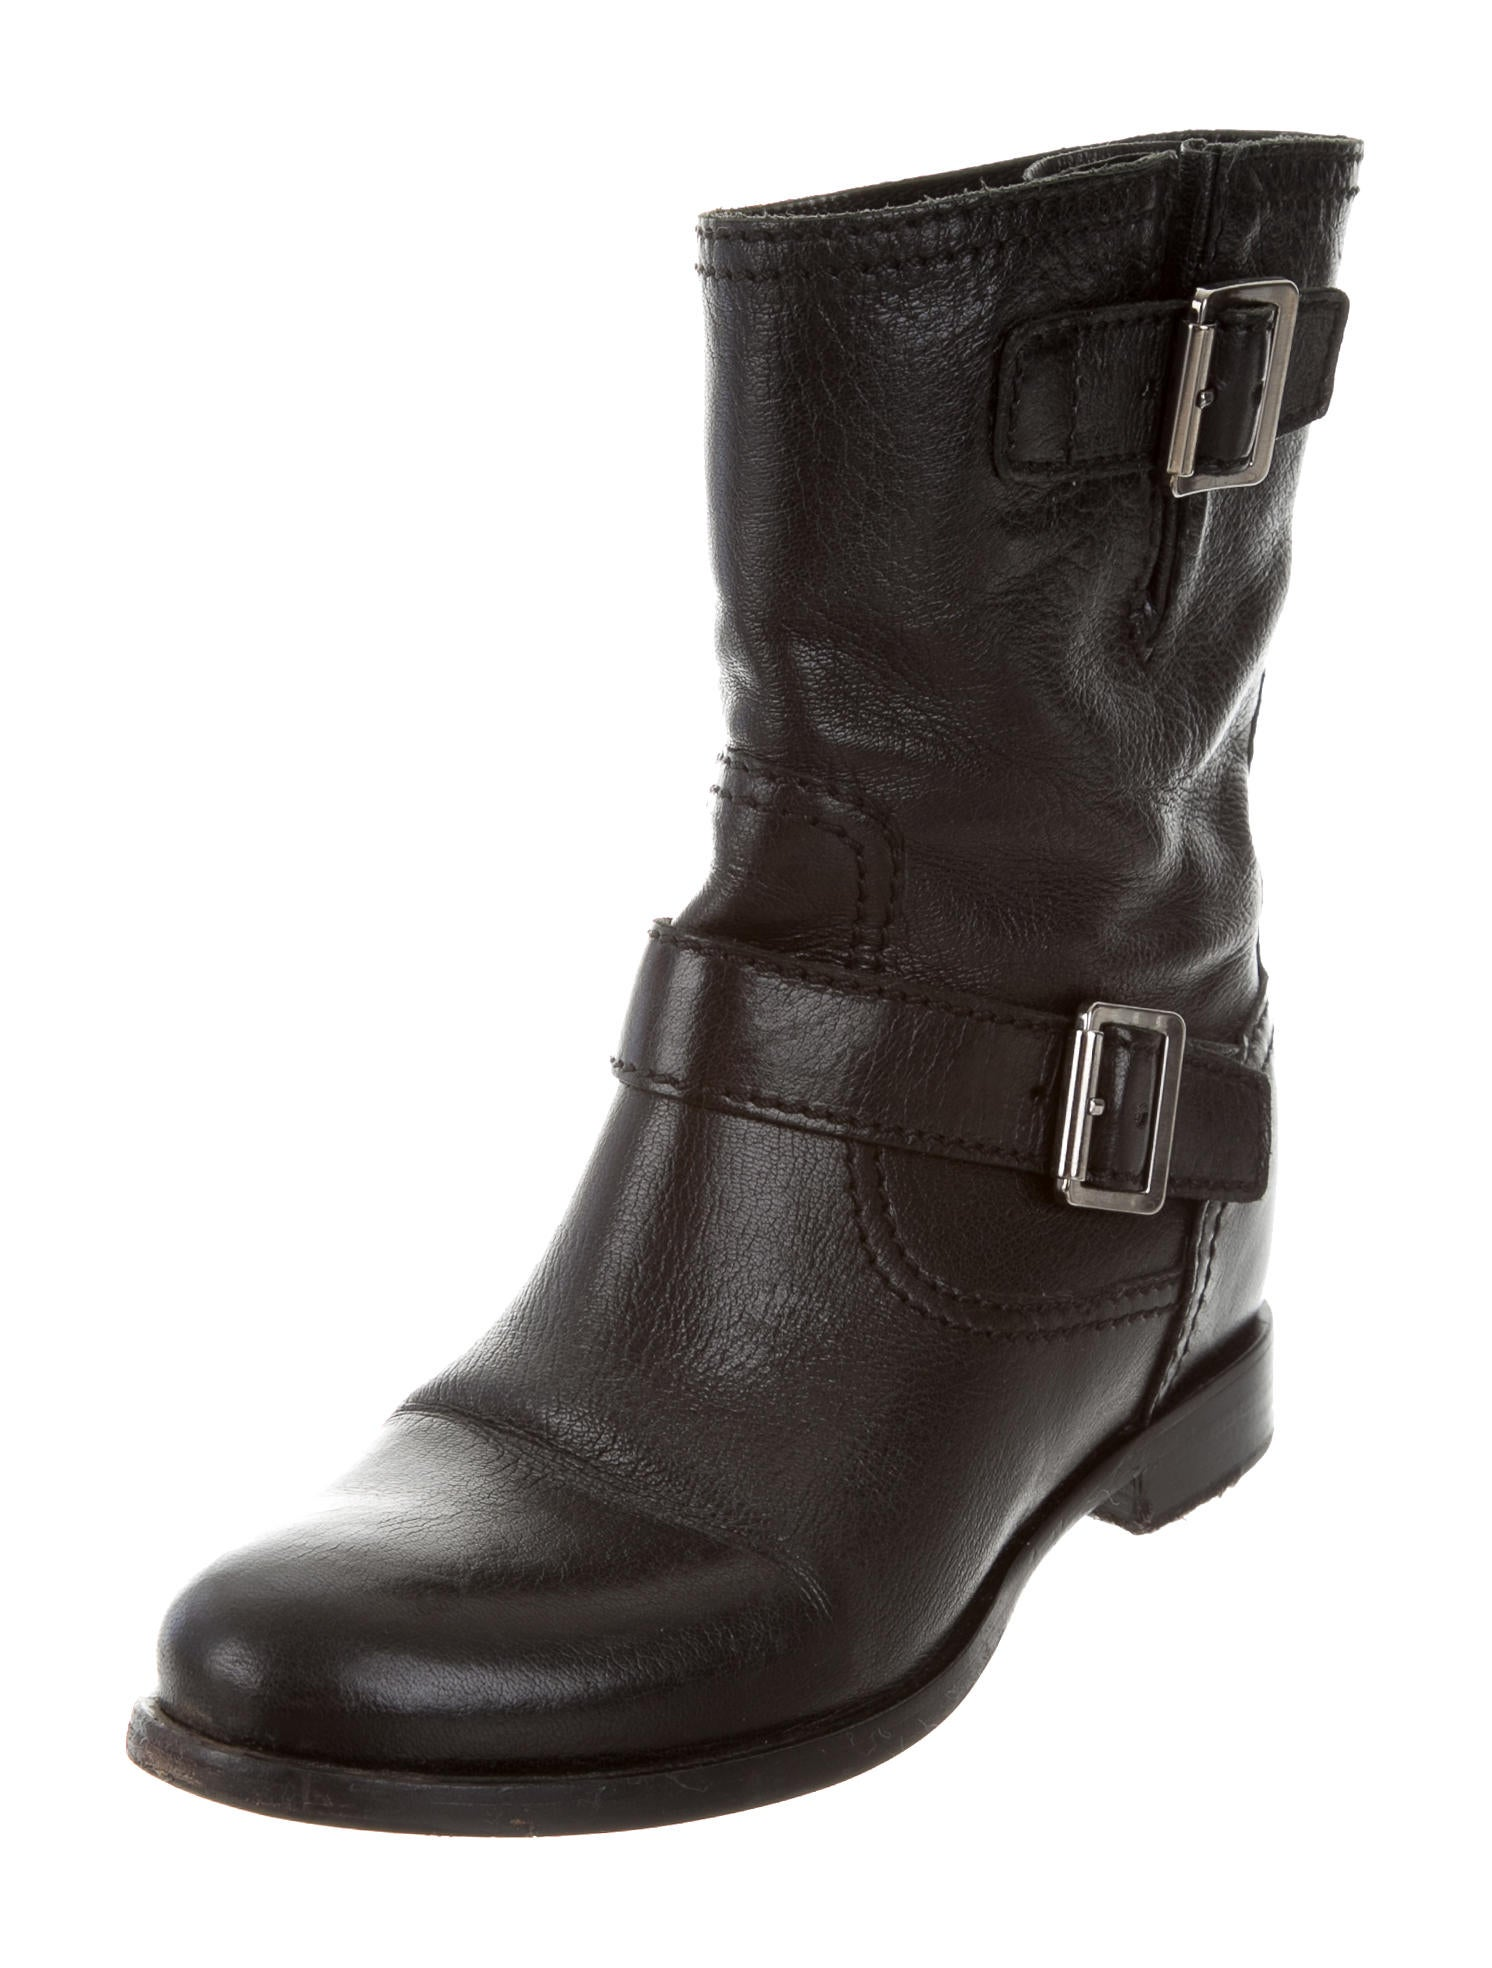 Prada Leather Biker Boots - Shoes - PRA141163 | The RealReal